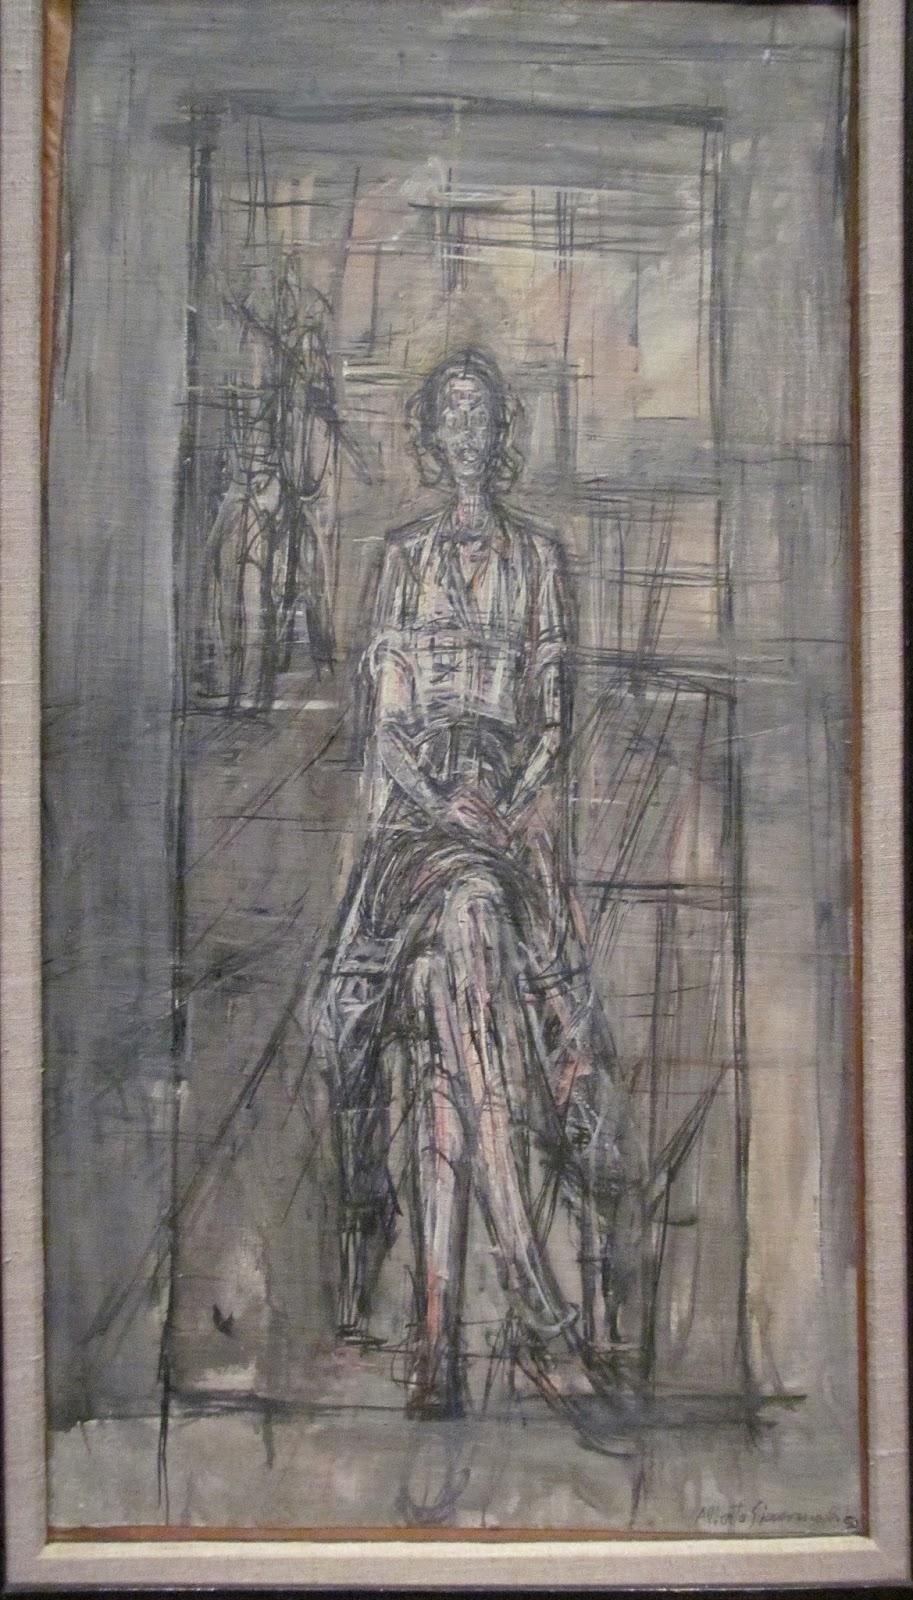 ArtHive: Alberto Giacometti - Painting and Mark Making